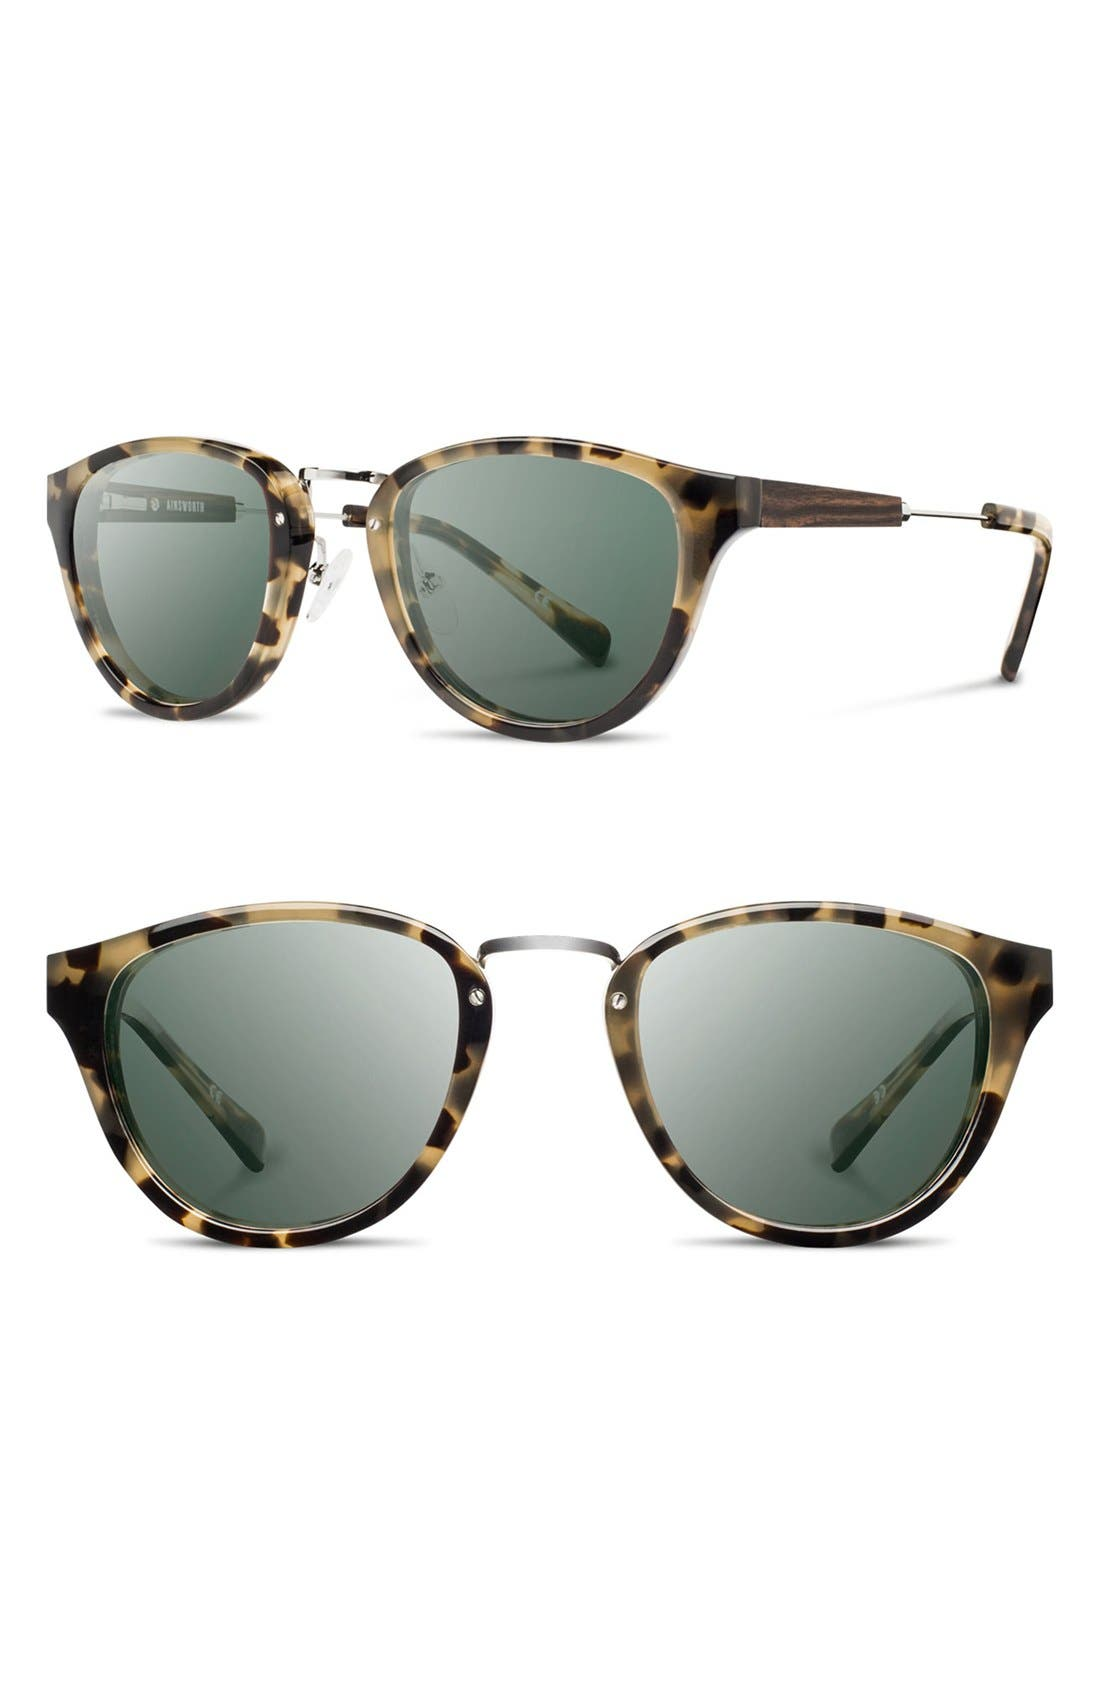 Shwood 'Ainsworth' 49mm Acetate & Wood Sunglasses